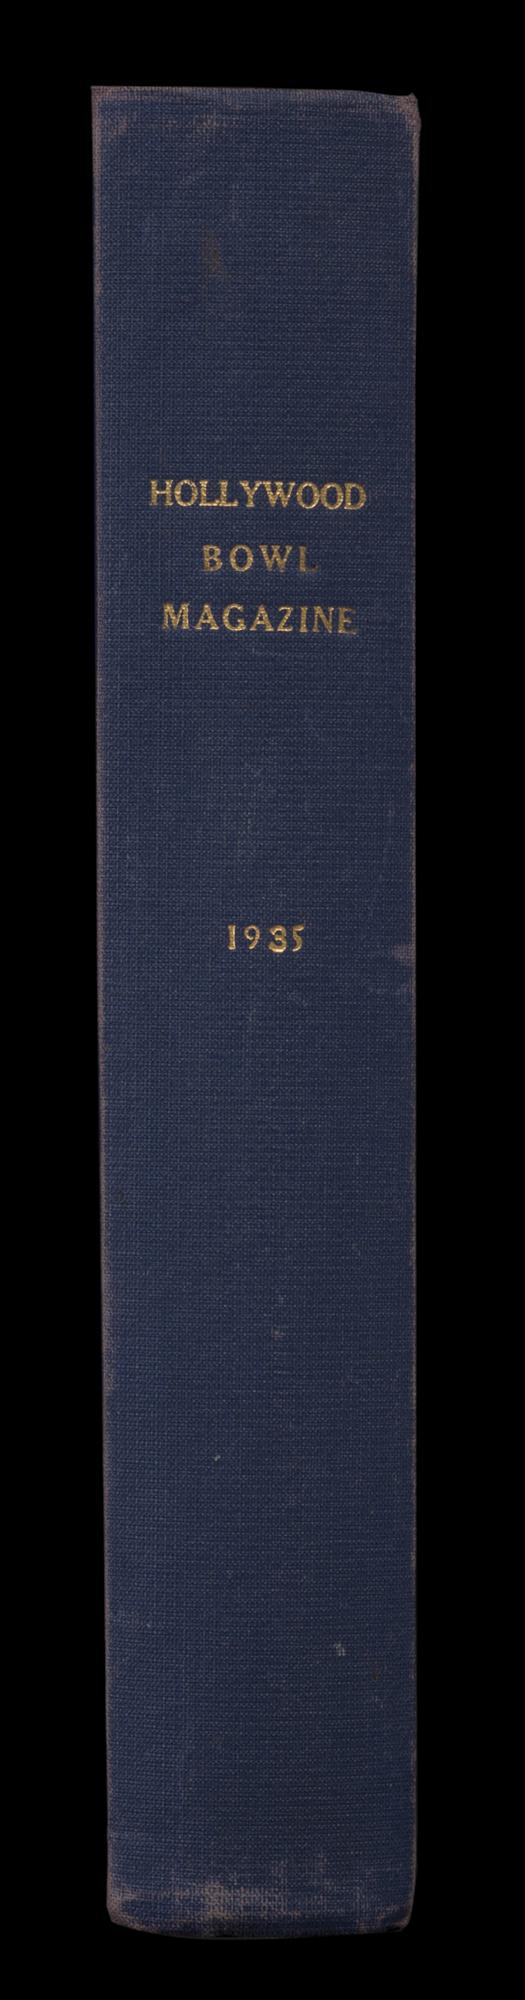 HB_ProgramBook_Spine_1935.jpg